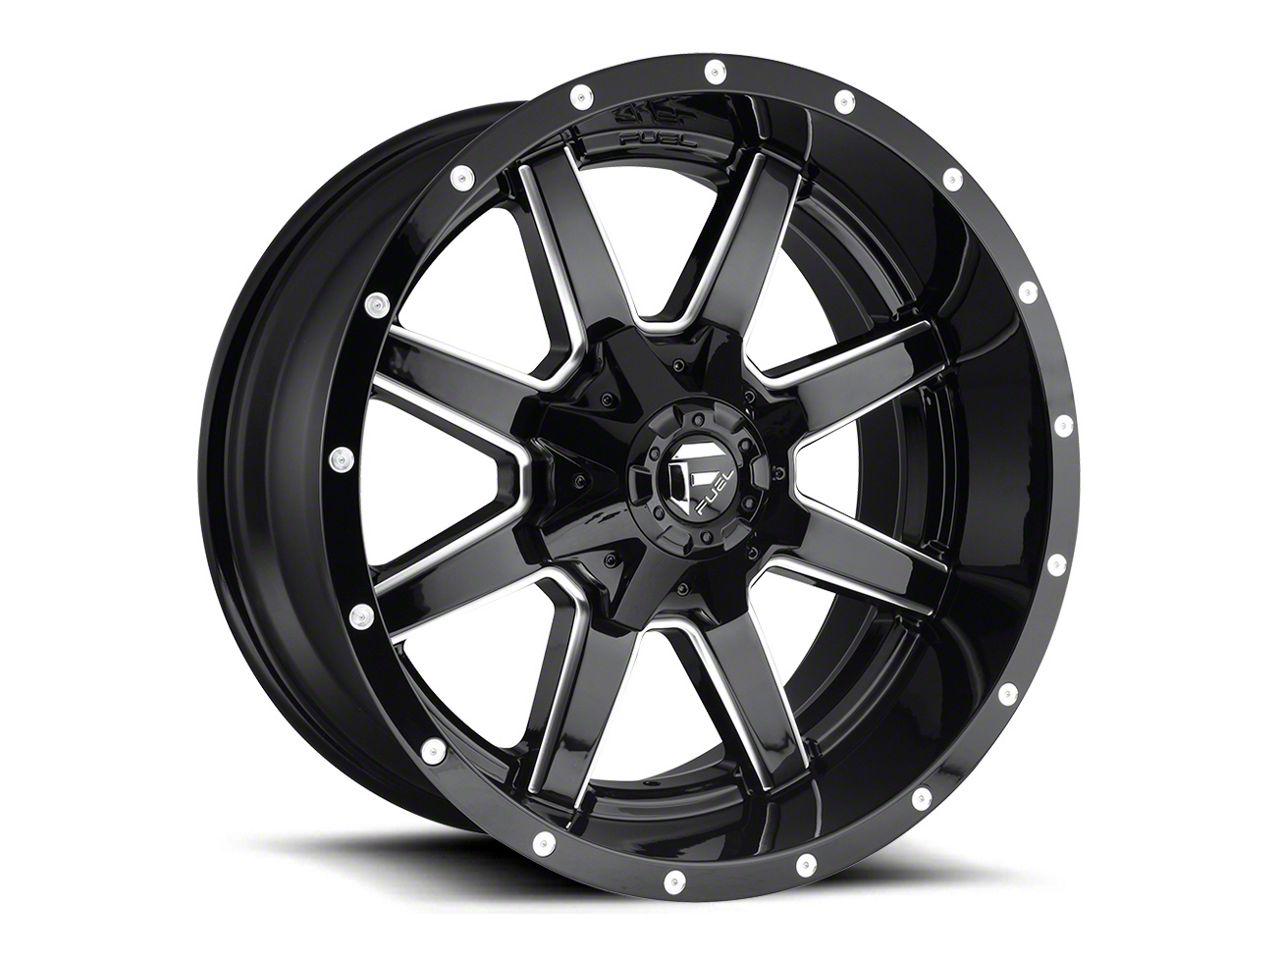 Fuel Wheels Maverick Gloss Black Milled 5-Lug Wheel - 20x10 (02-18 RAM 1500, Excluding Mega Cab)